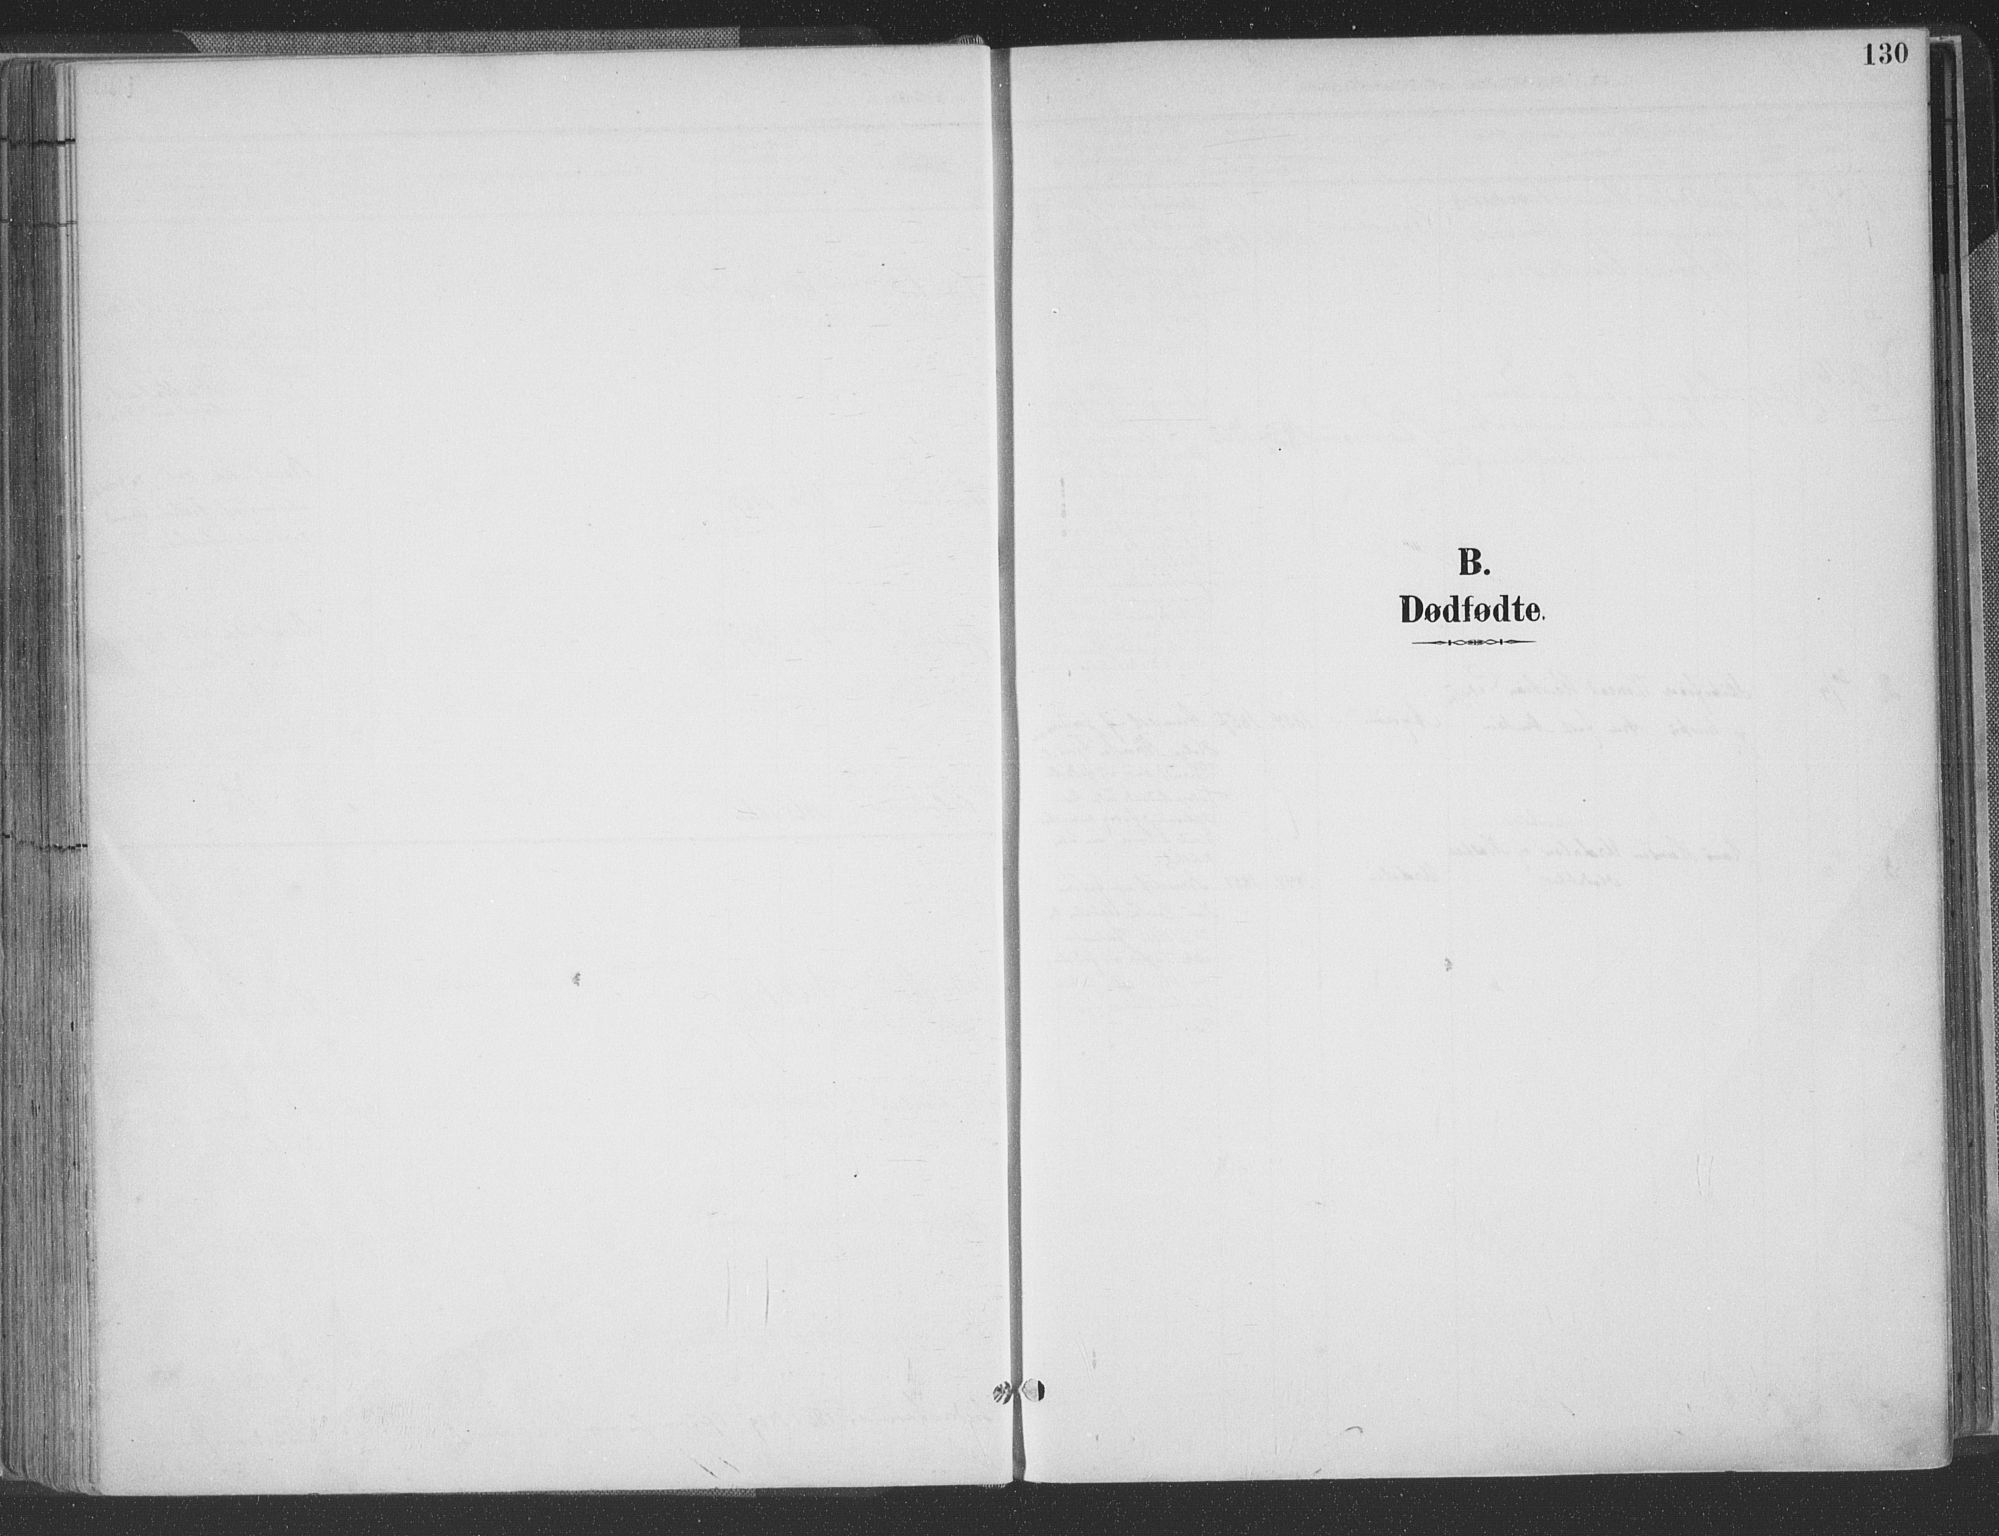 SAK, Høvåg sokneprestkontor, F/Fa/L0006: Ministerialbok nr. A 6, 1894-1923, s. 130